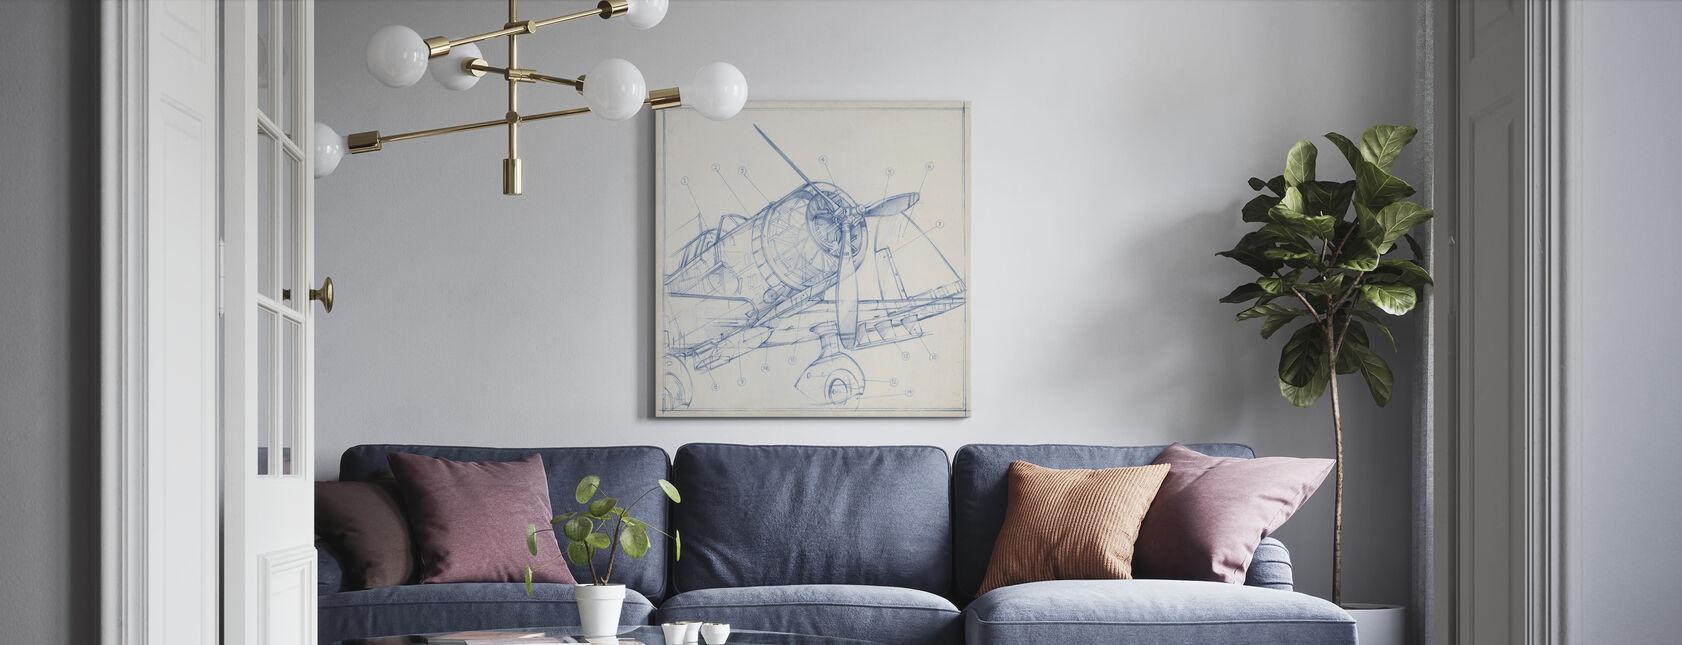 Airplane Mechanical Sketch - Canvas print - Living Room